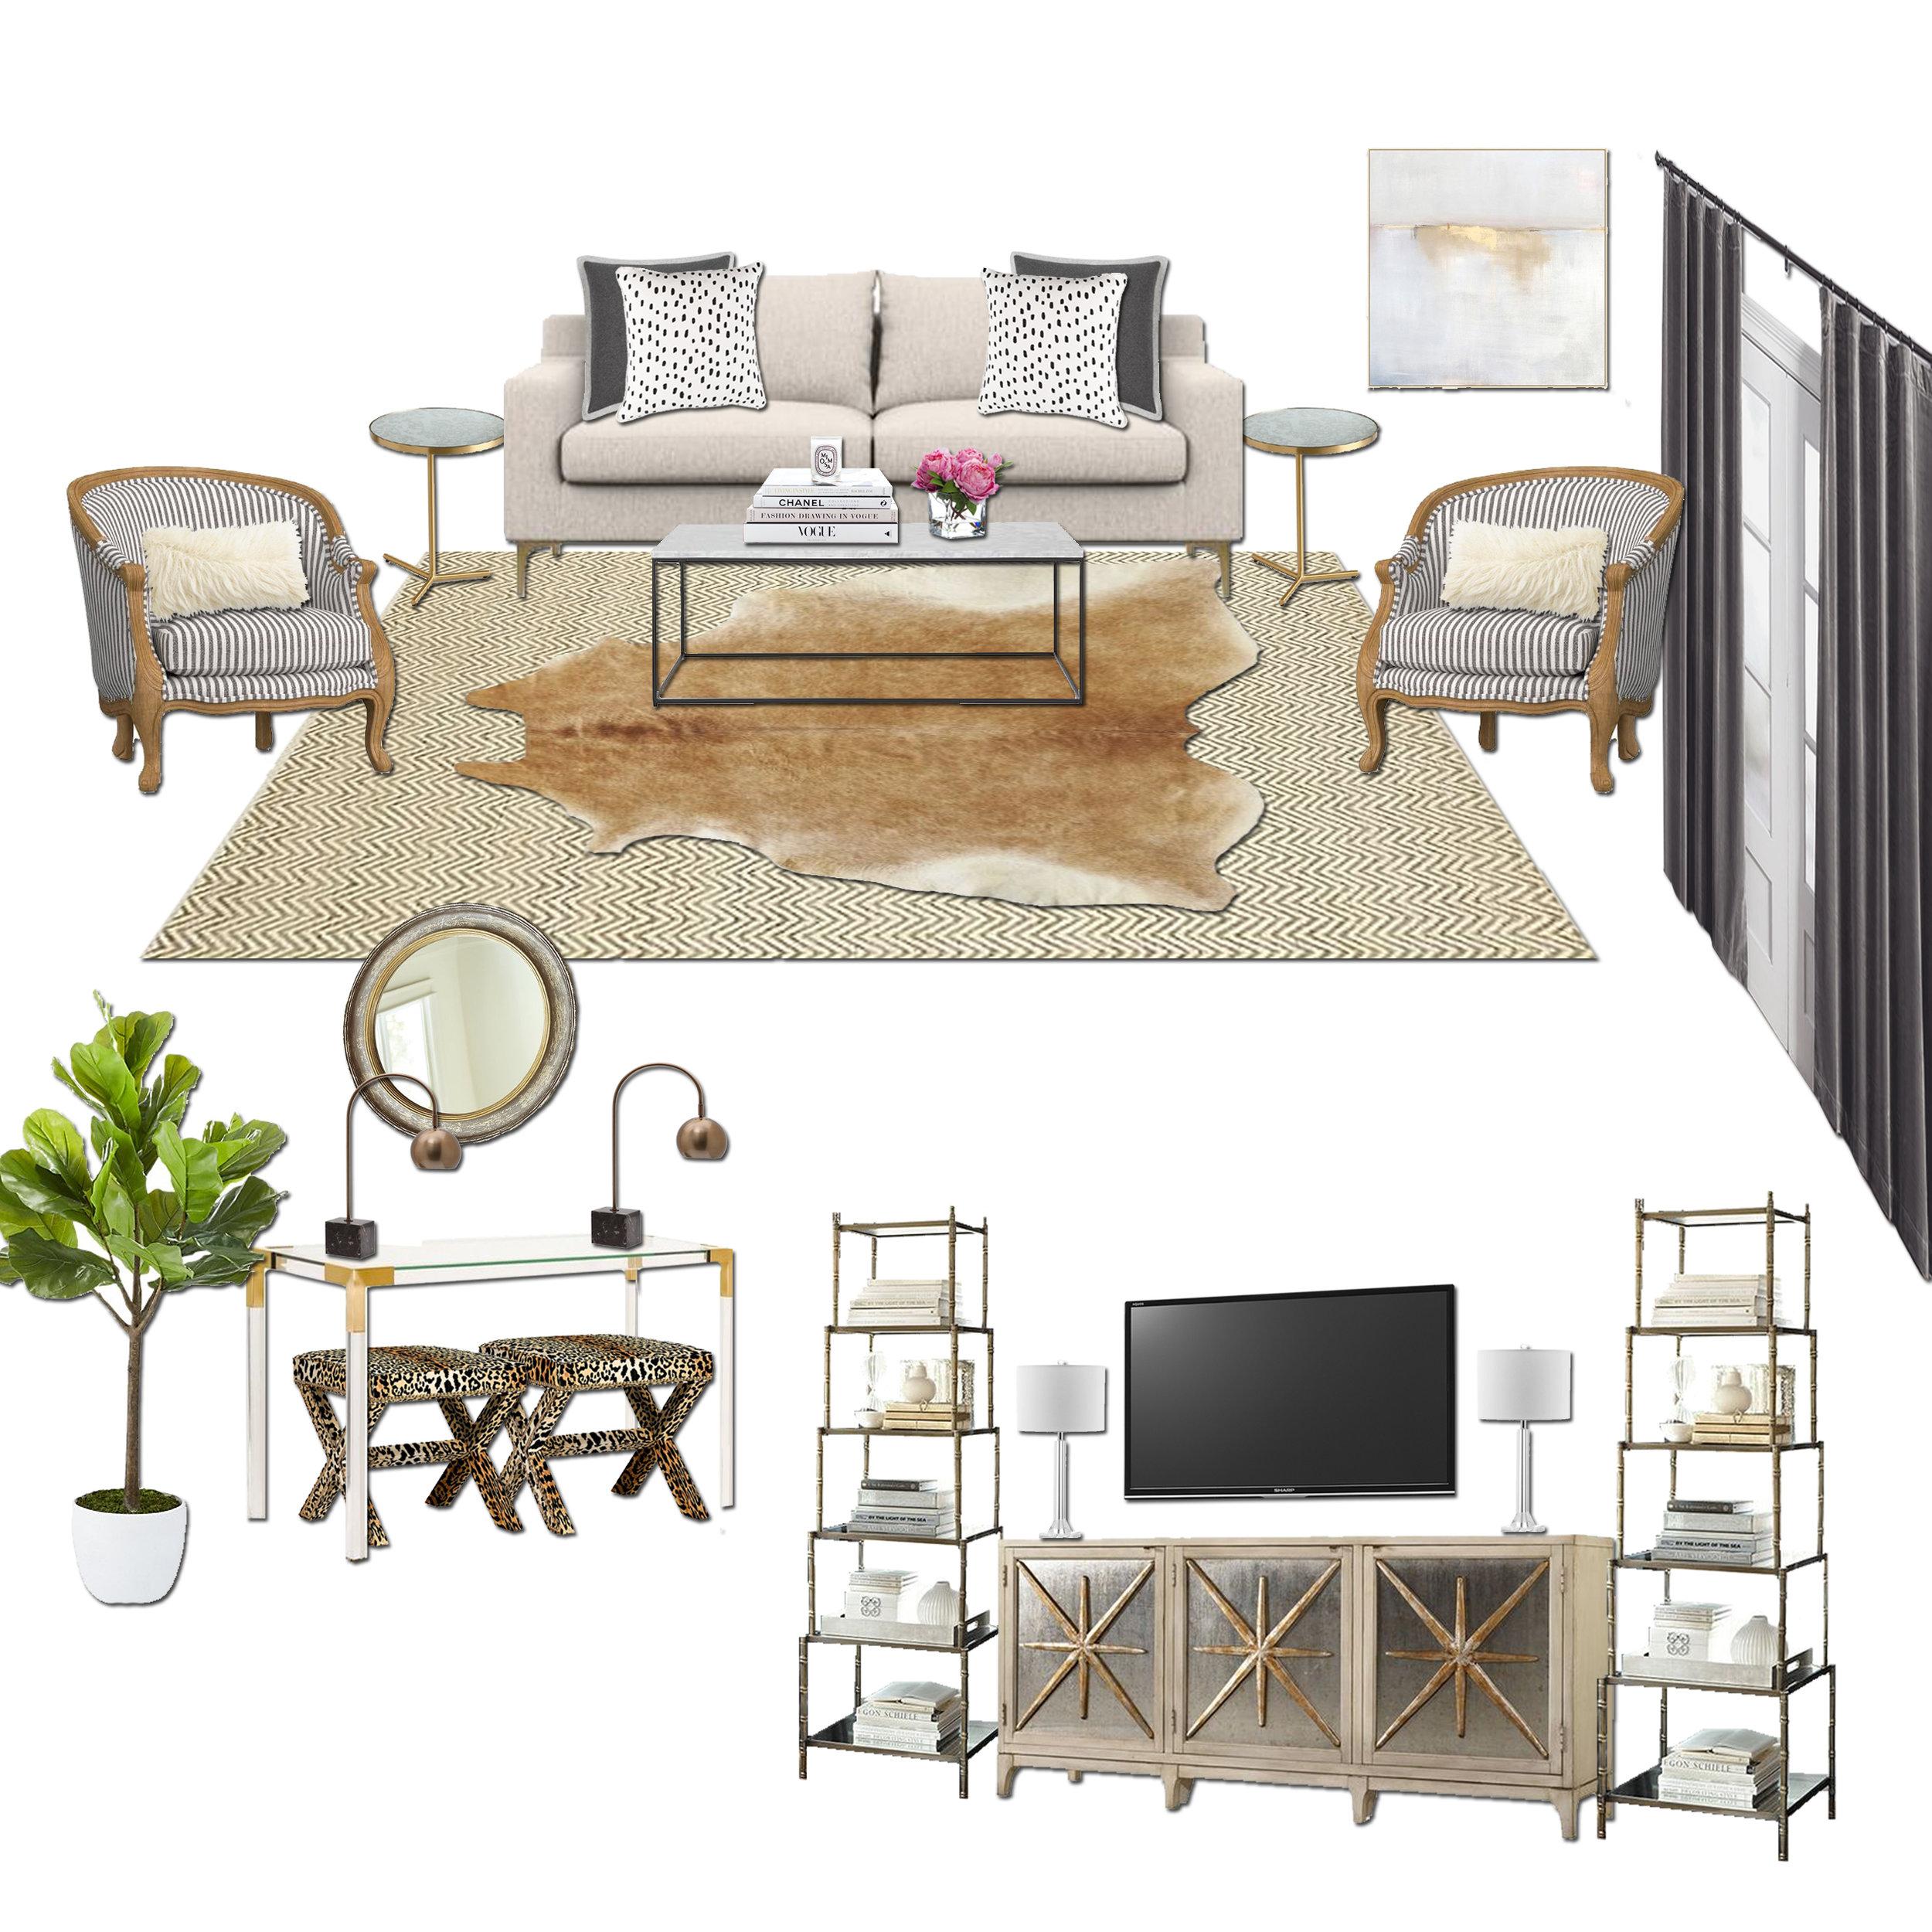 Johnson Living Room Concept Board.jpg